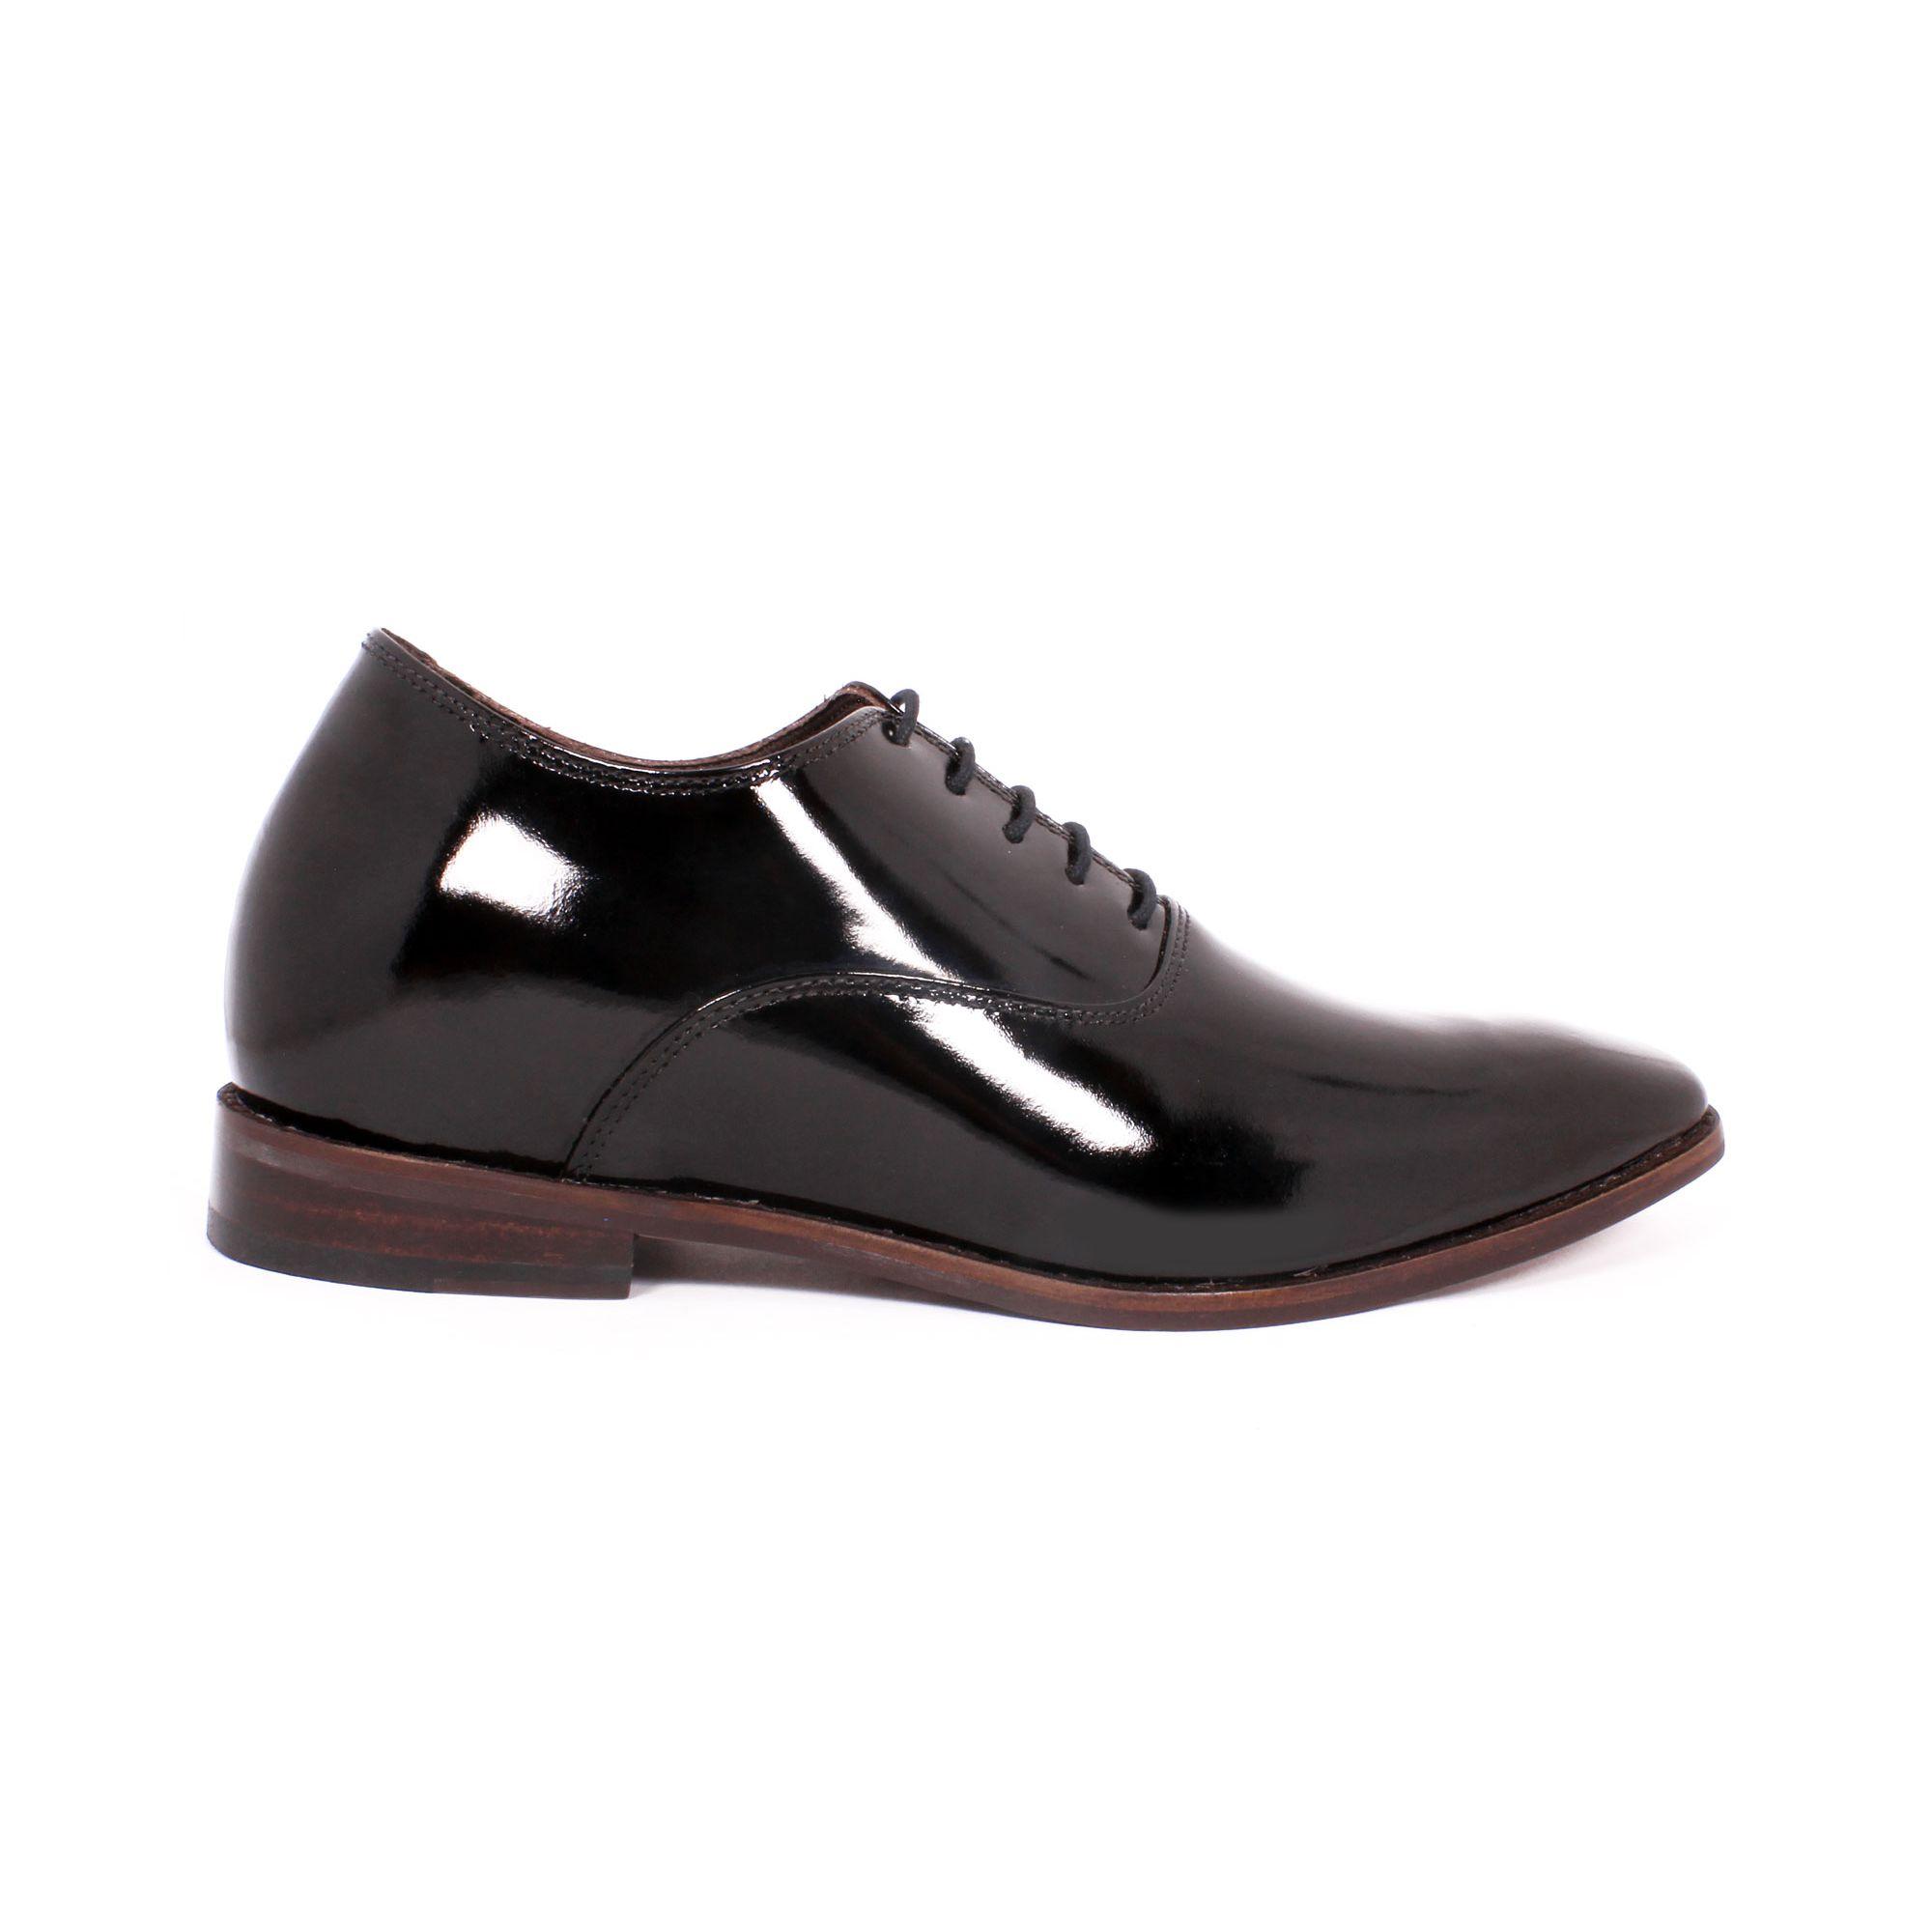 Zapato Formal Elegant Charol Negro Max Denegri +7cm de Altura_70808